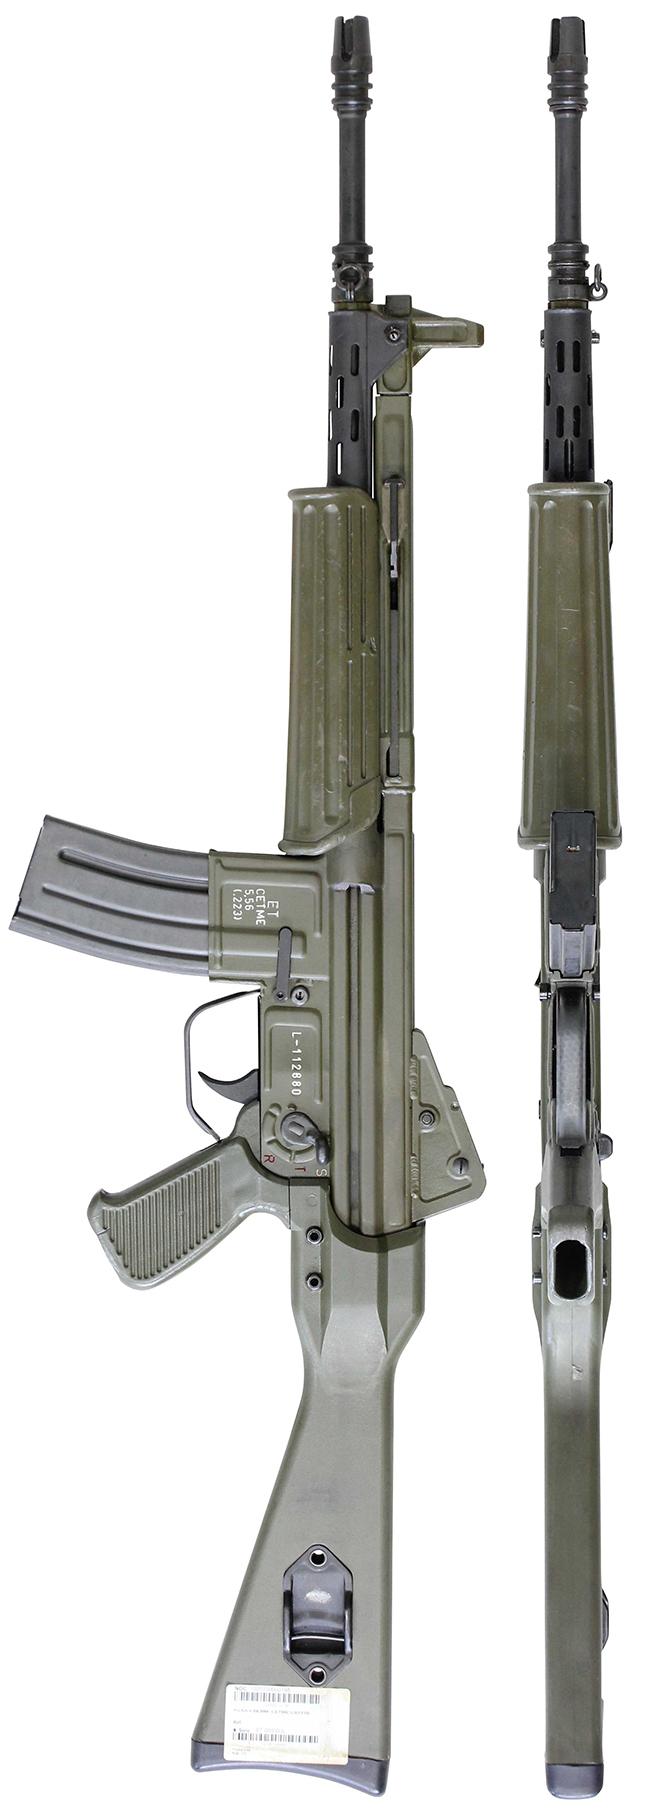 【HP無】セトメ-モデロL-自動小銃-(#L-112880)下.jpg